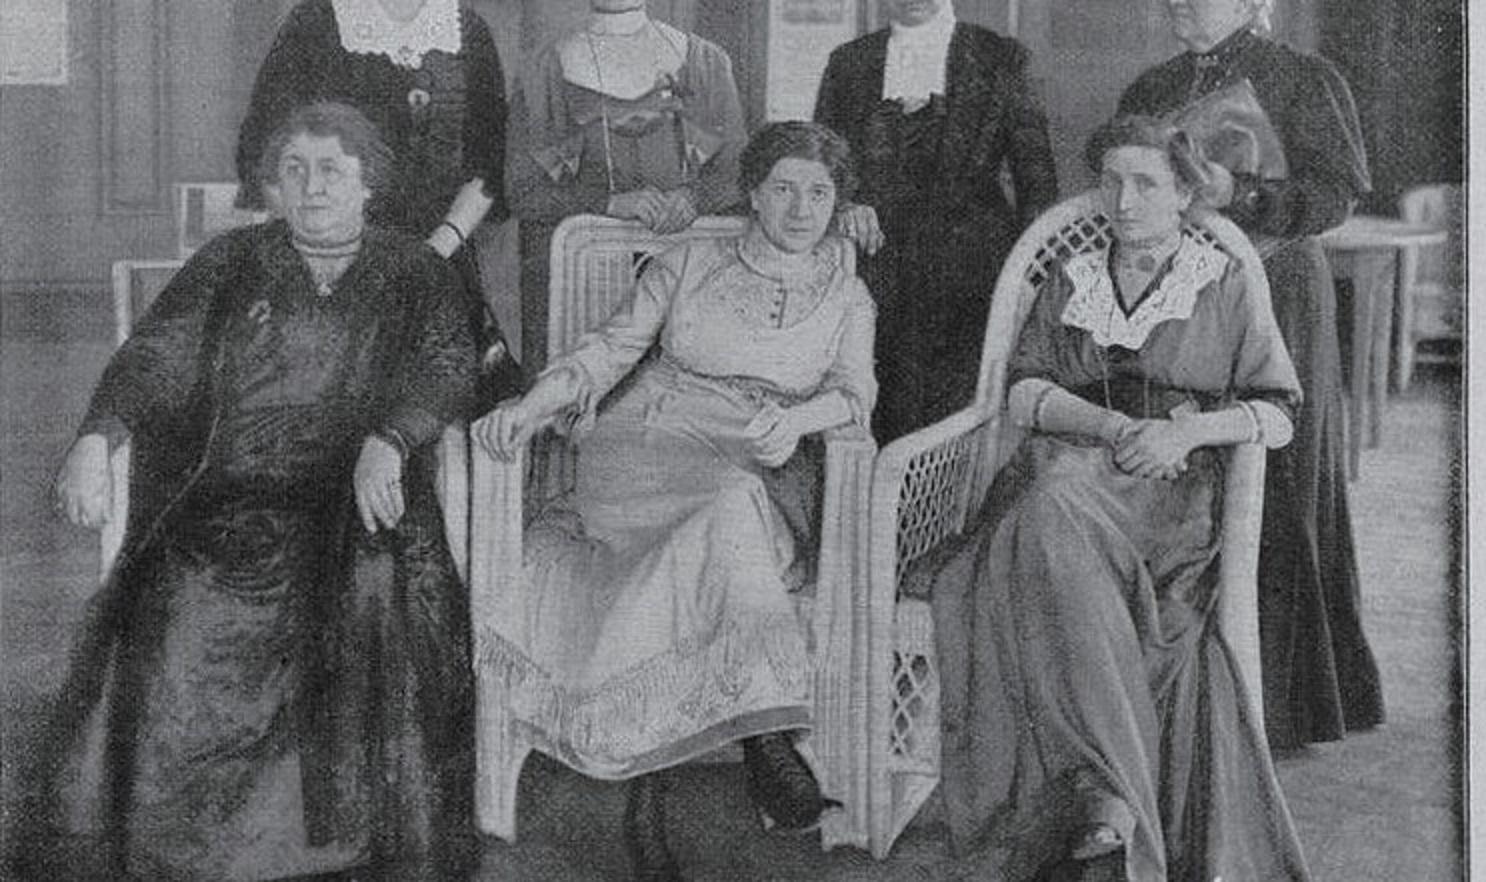 Gertrud Bäumer (1873-1954) – Frauenrechtlerin, Politikerin, Multitaskerin